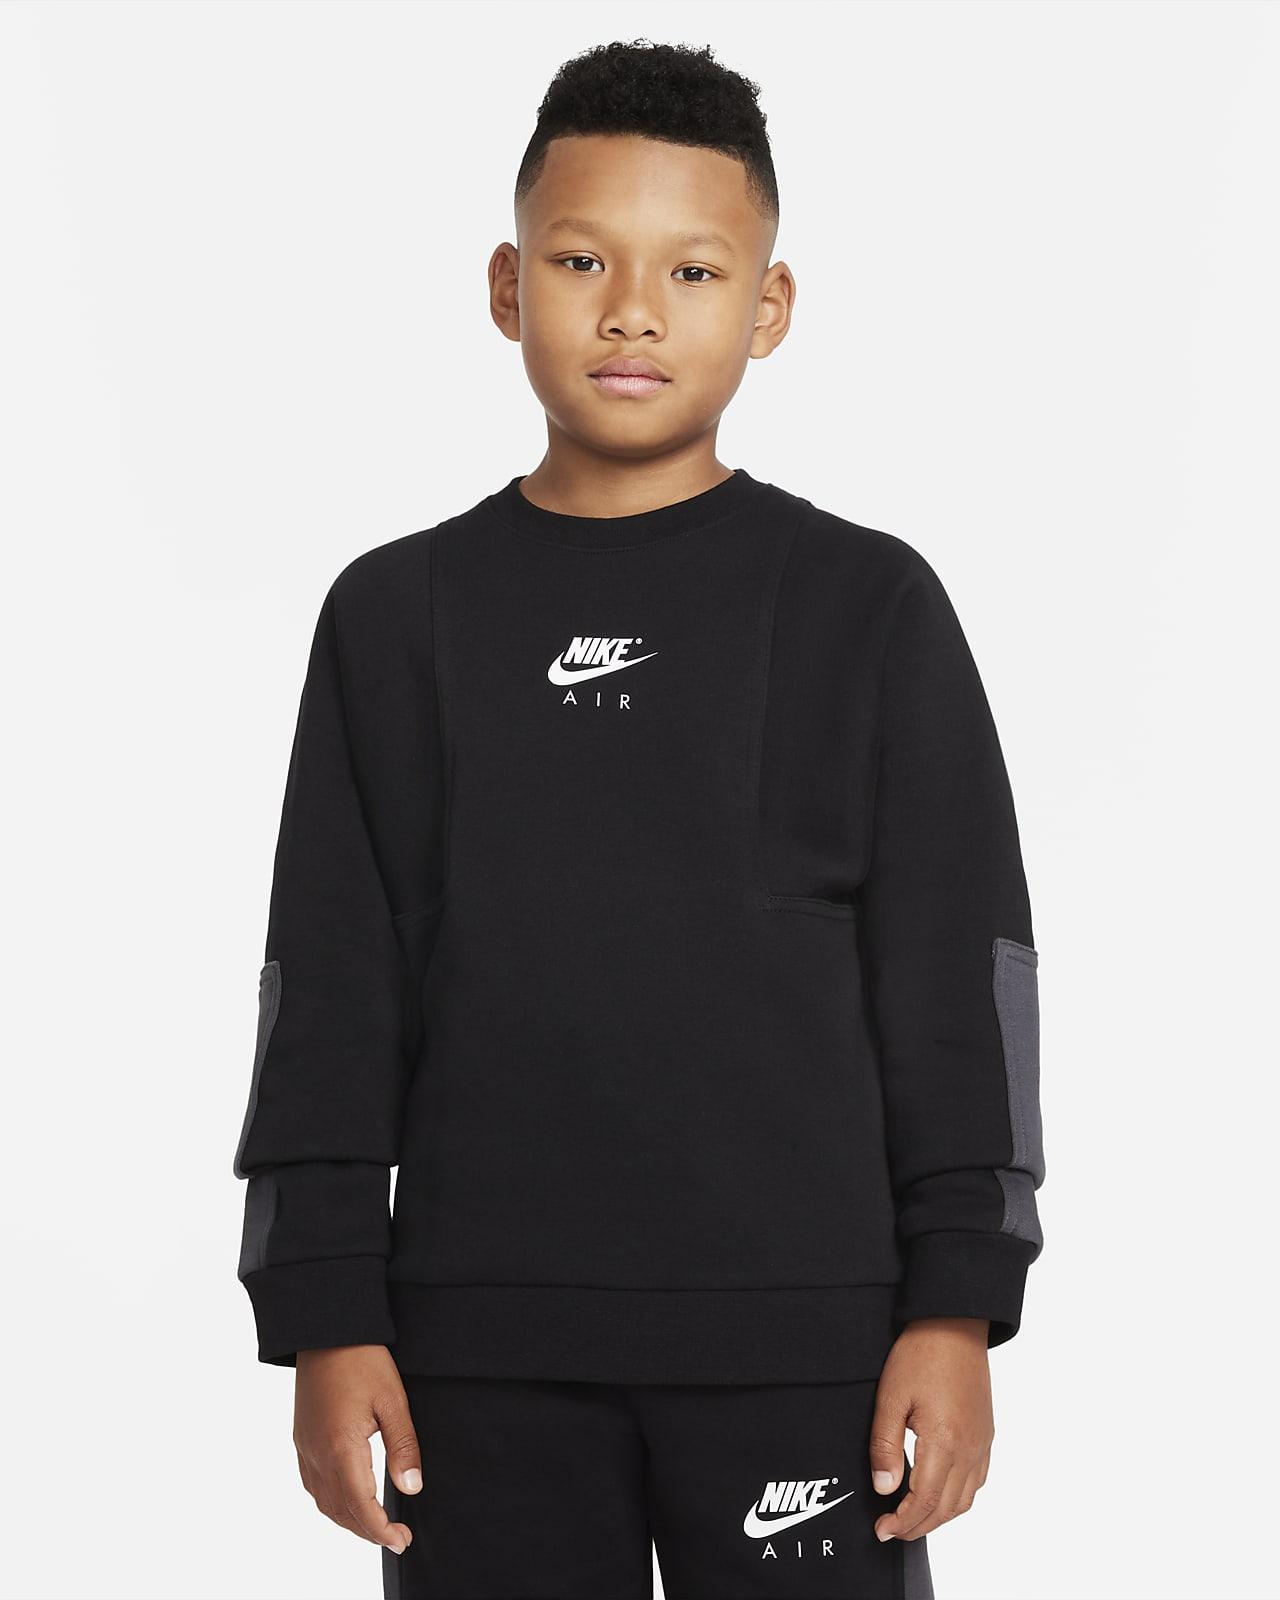 Nike Air Big Kids' (Boys') Sweatshirt